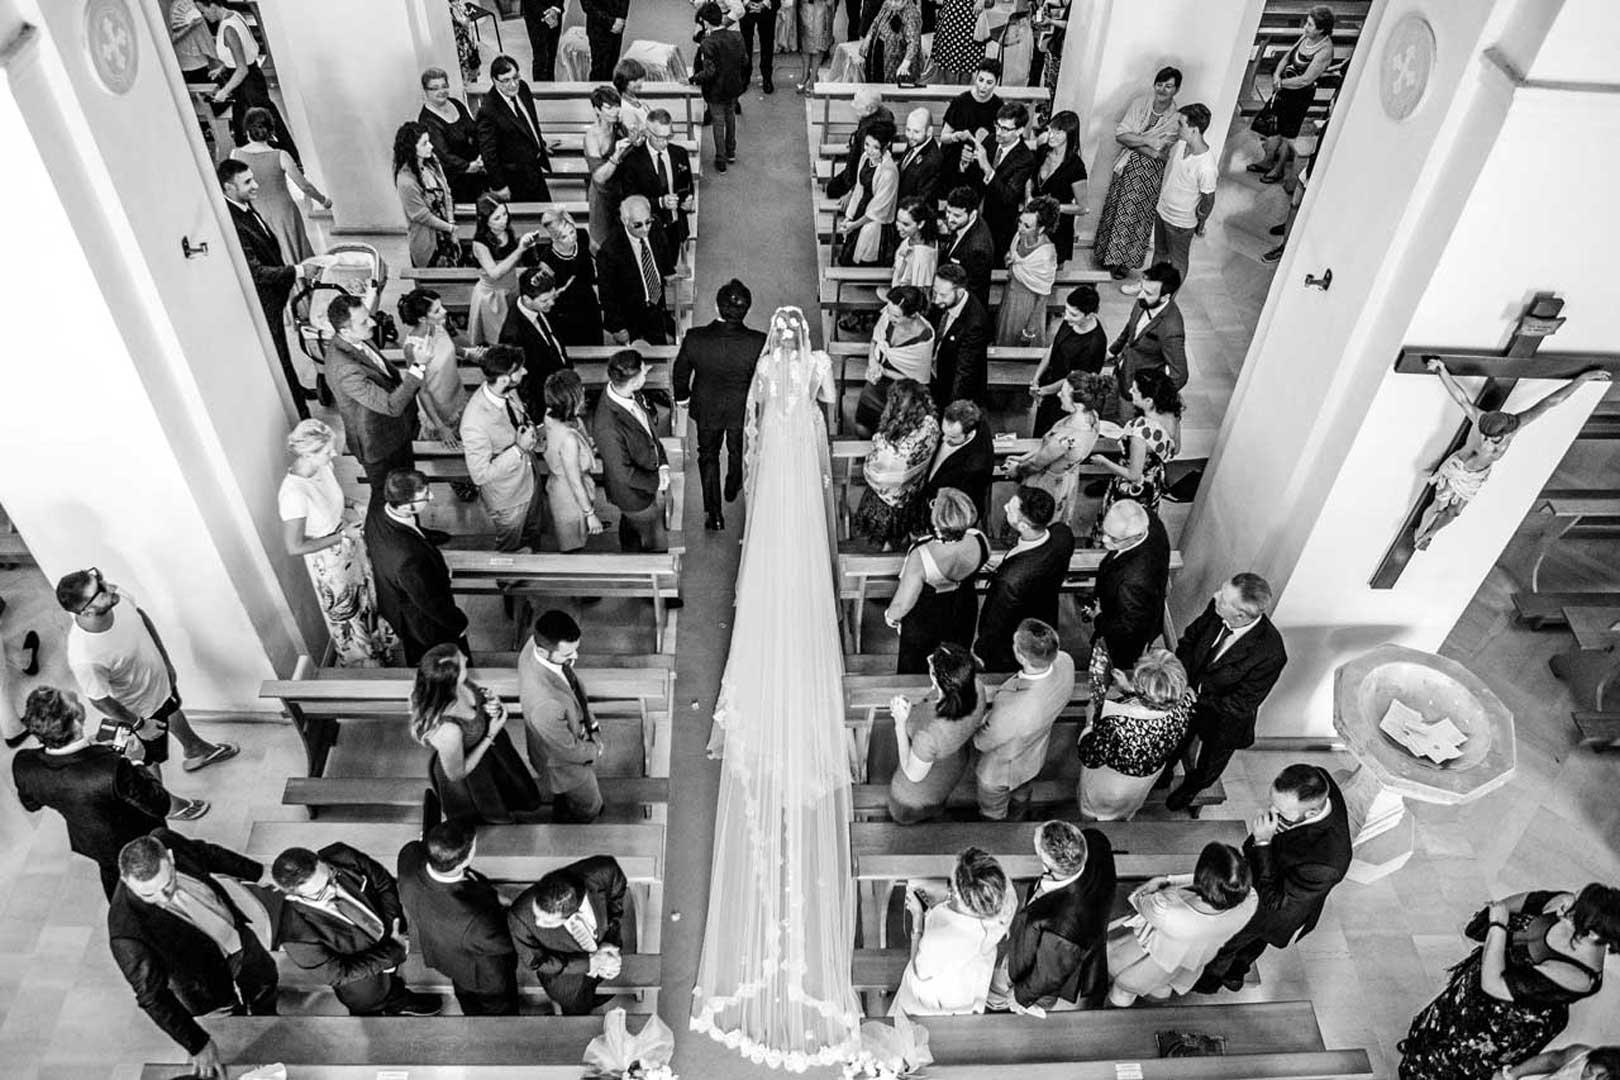 017-ingresso-sposa-gianni-lepore-fotografo-lucera